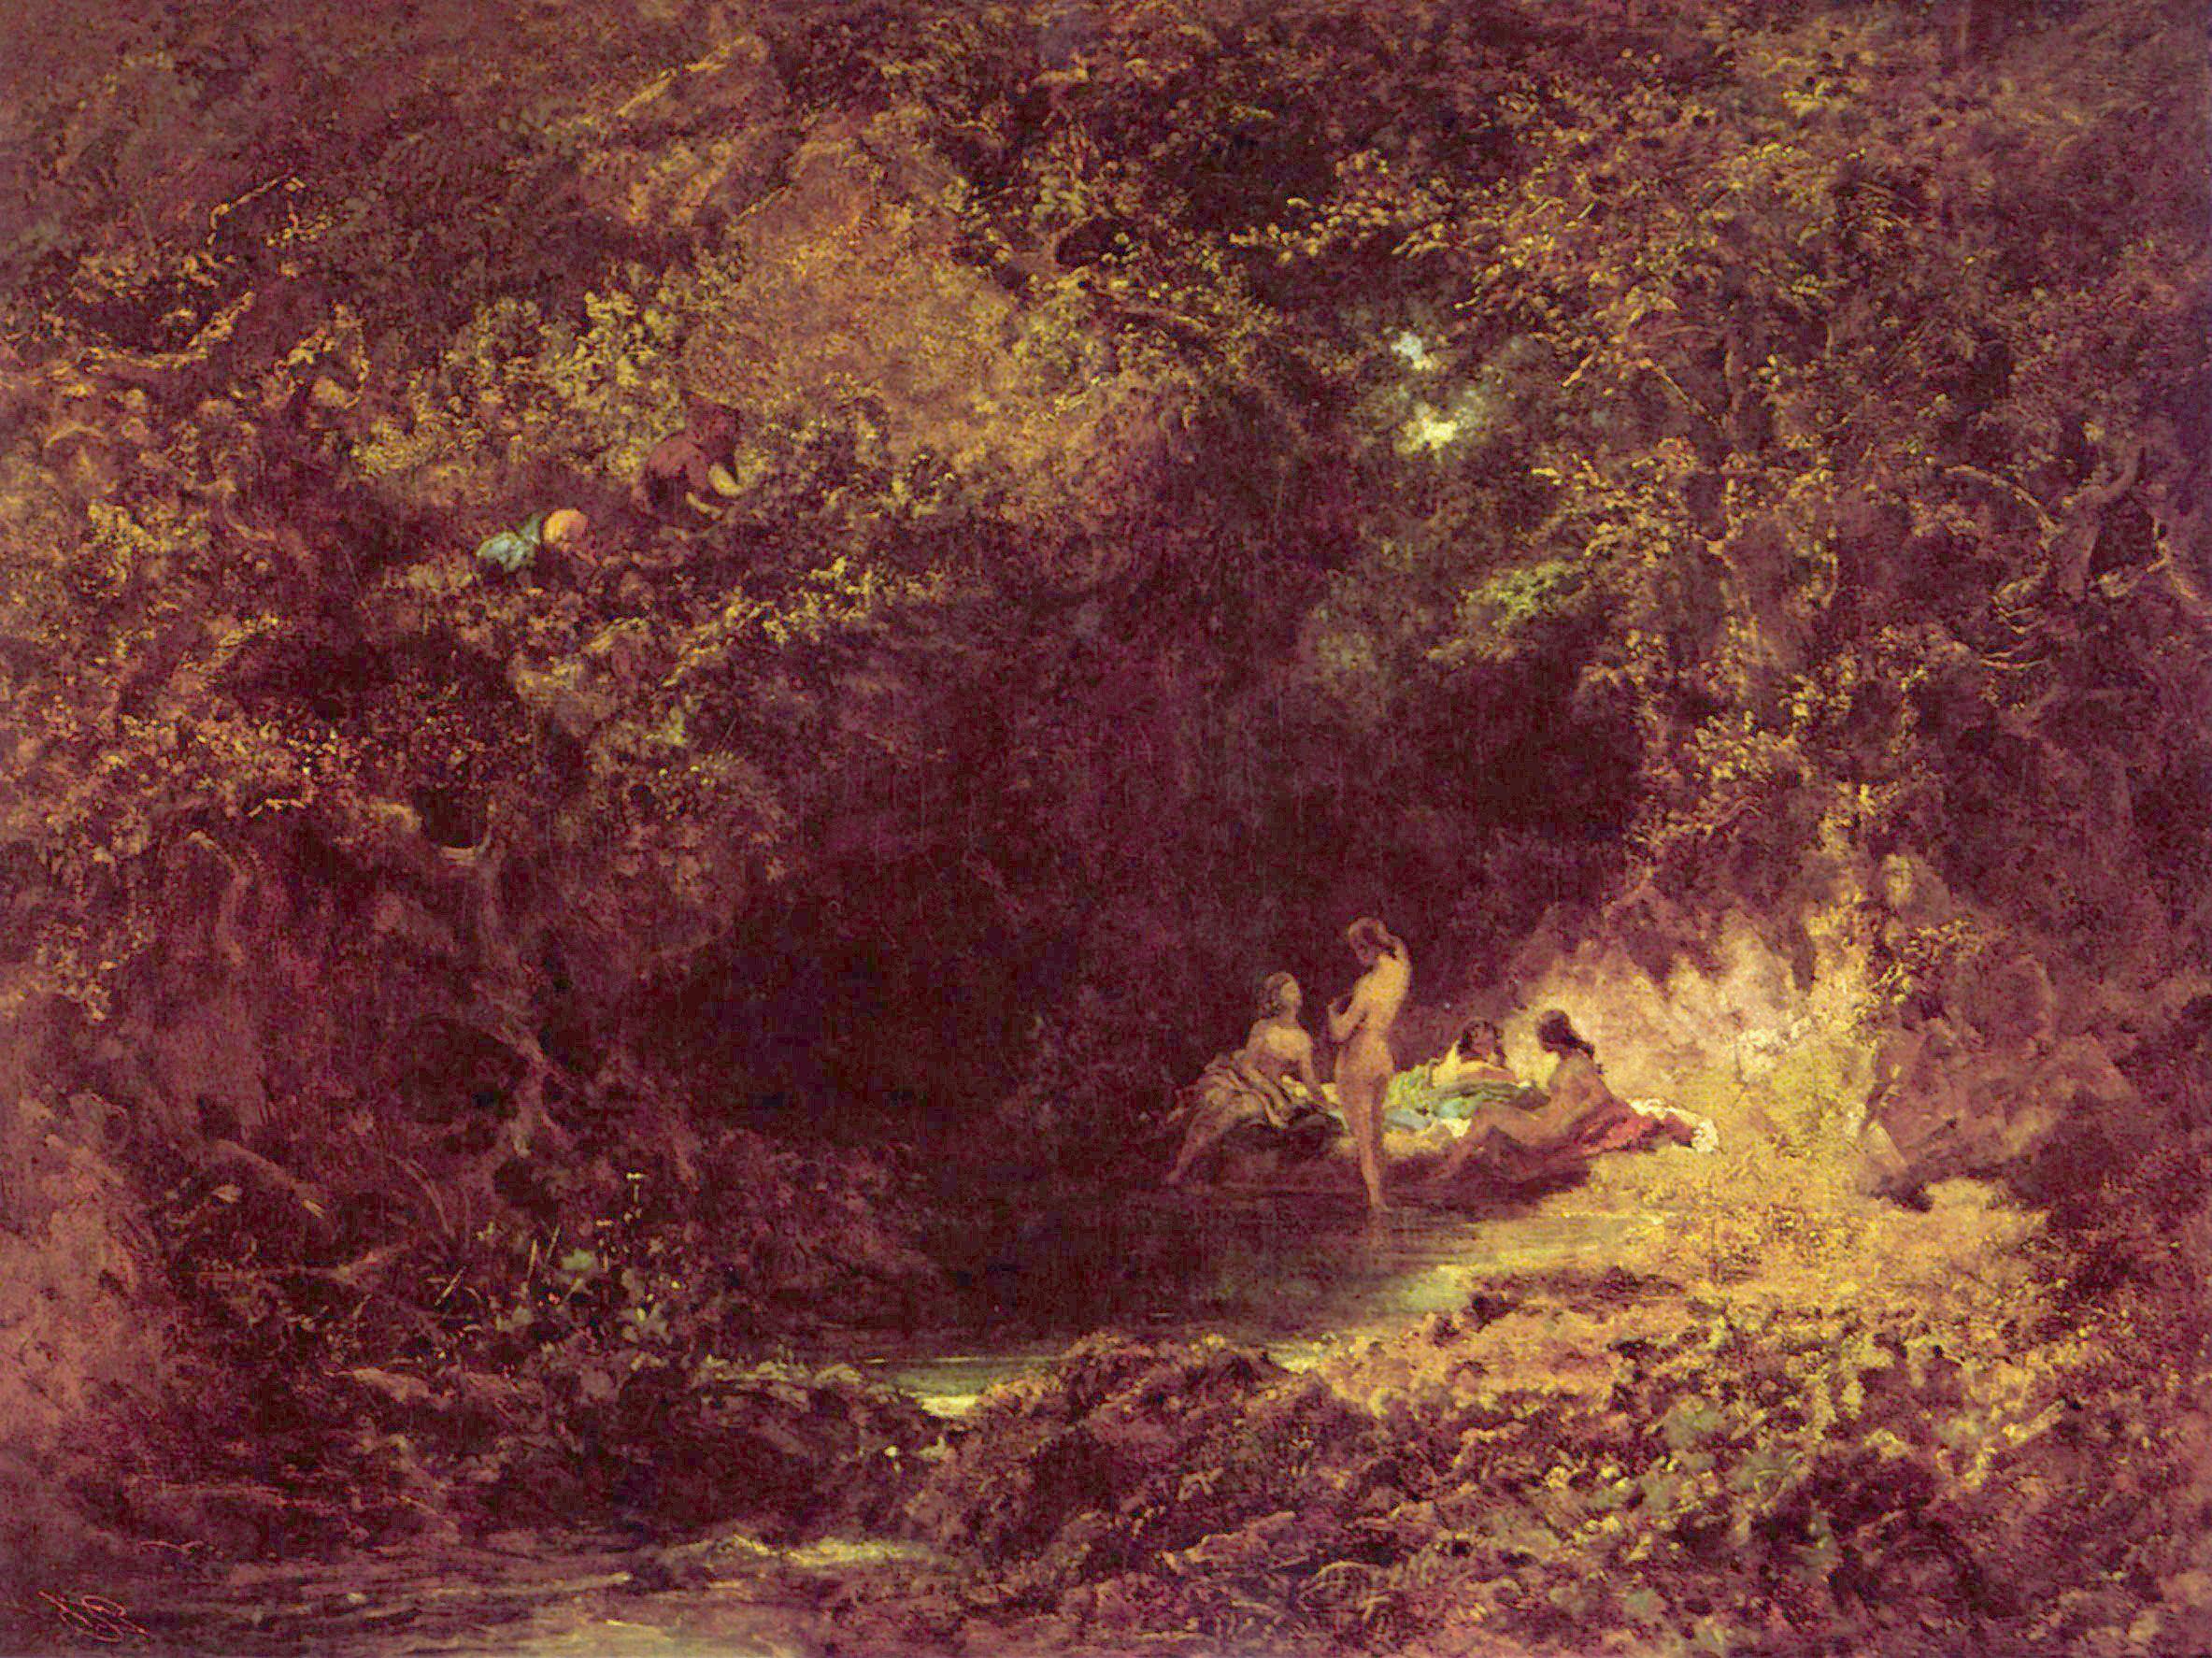 Badende Nymphe Carl Spitzweg Wald Teich Lichtung Akt Rücken H A3 0526 Gerahmt